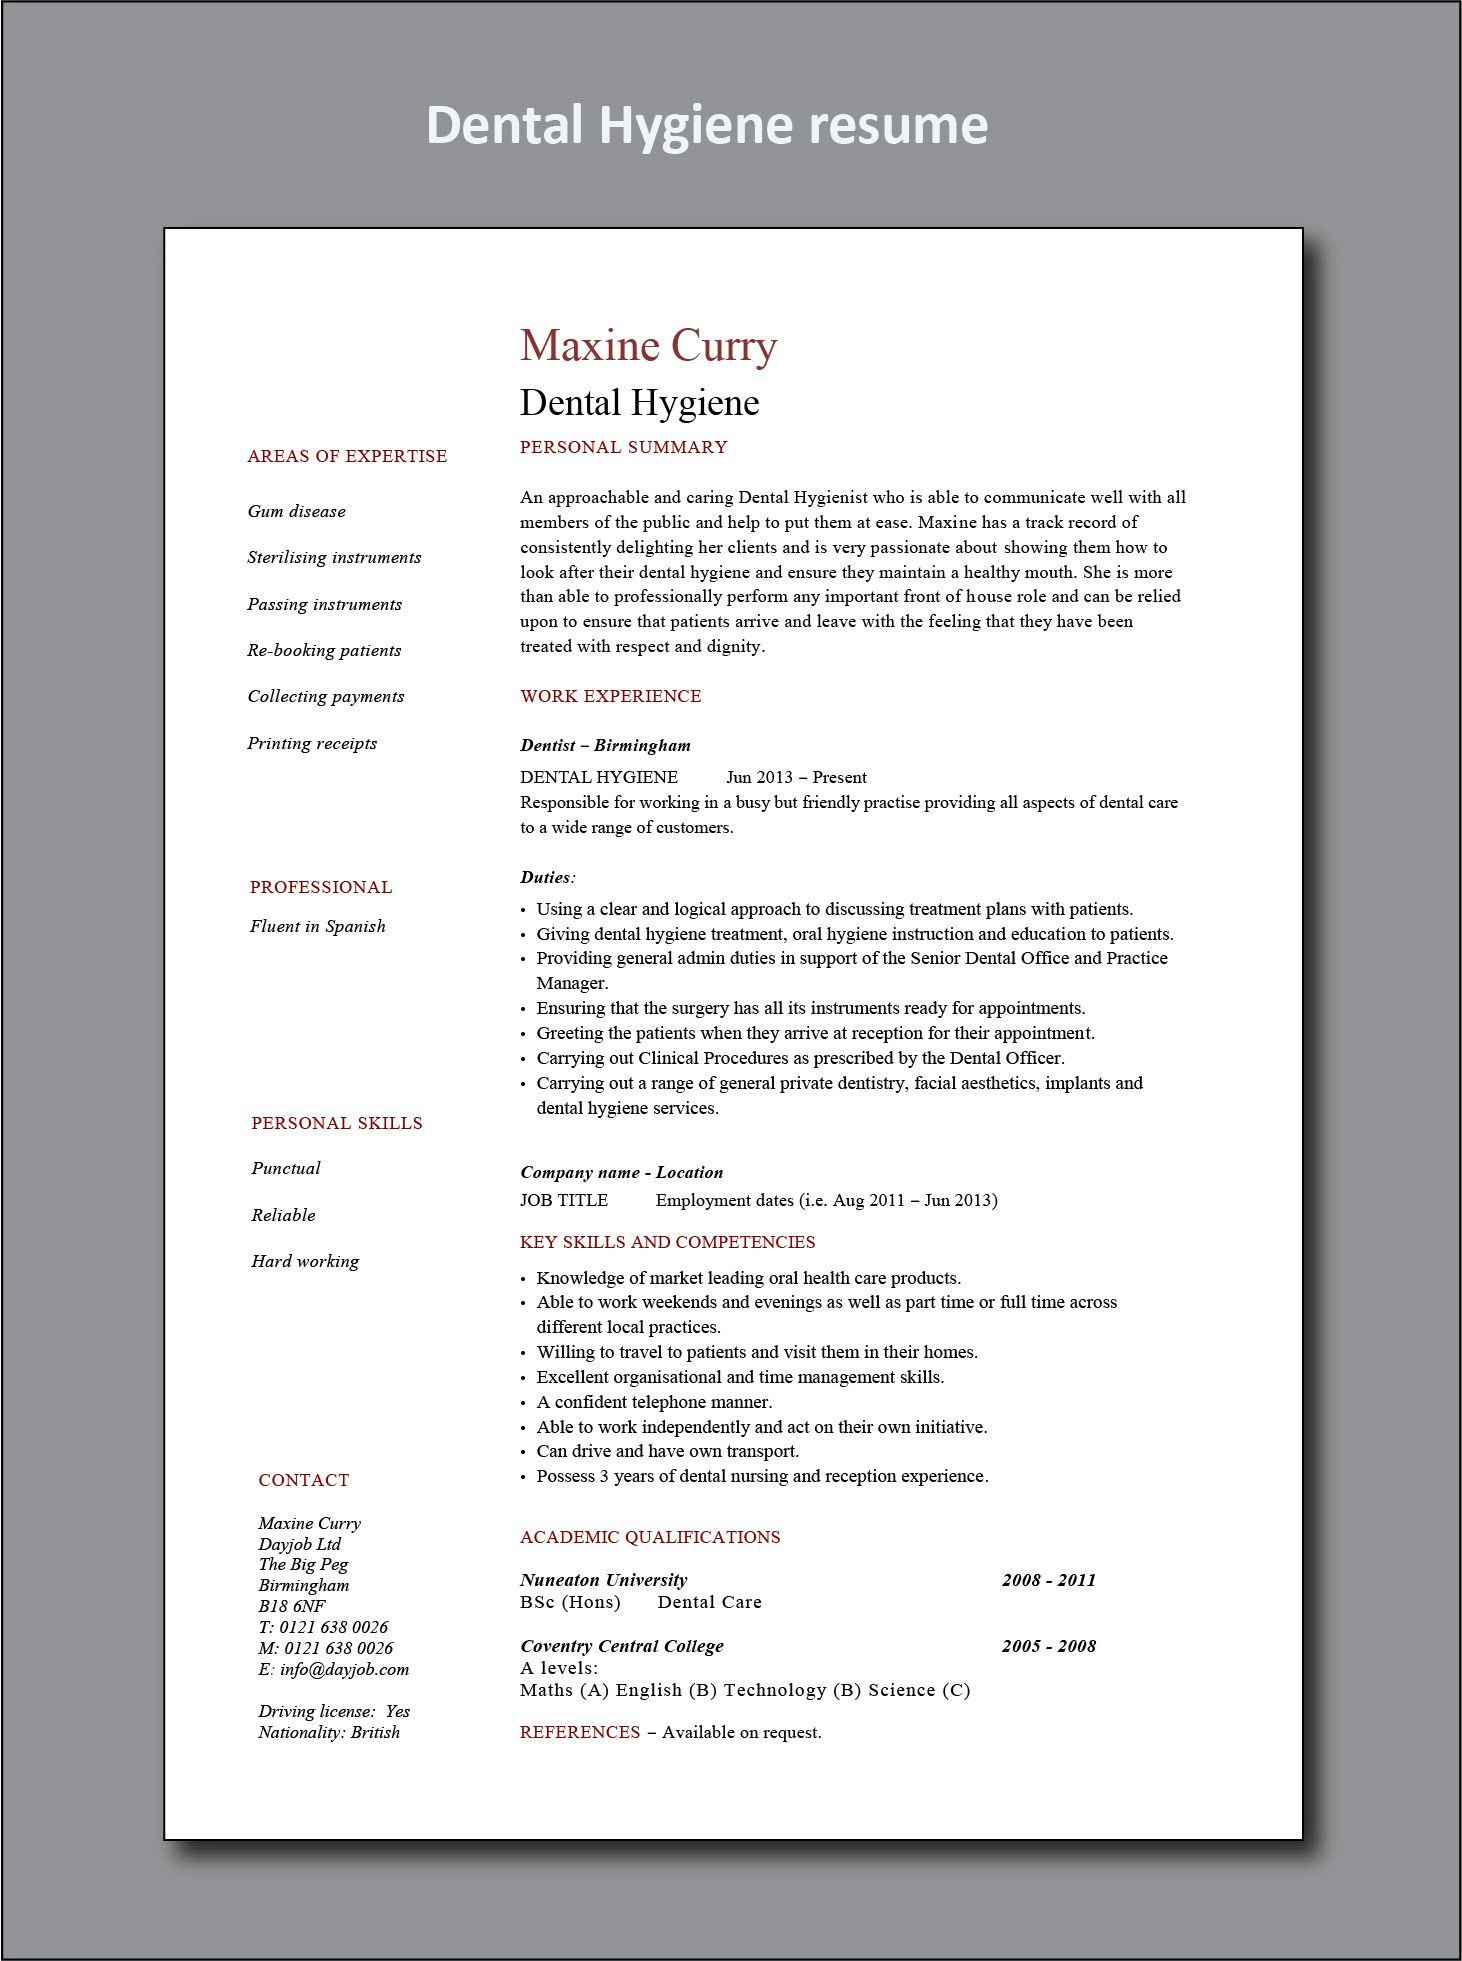 Dental hygiene resume example cv hygienist healthcare